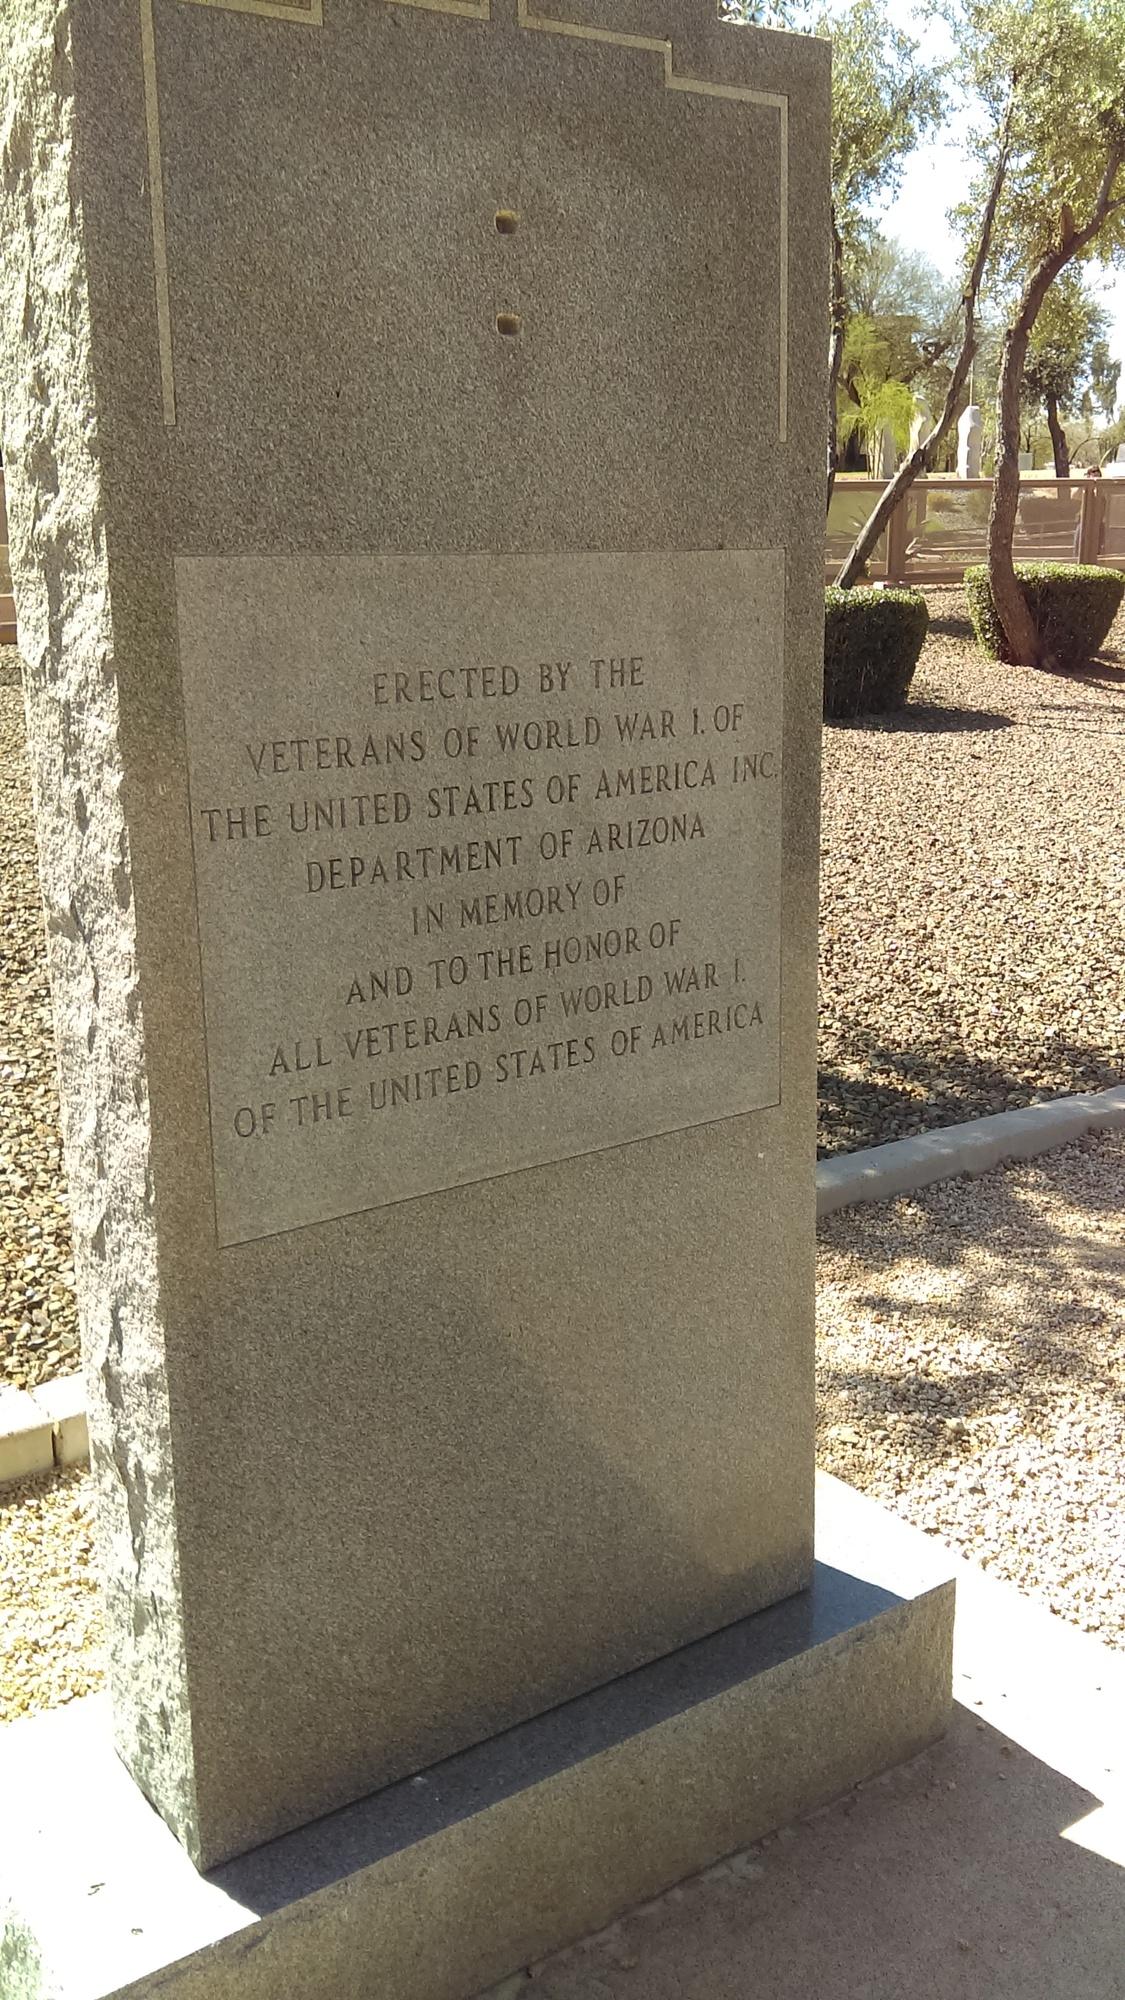 Veterans of World War I of the USA Memorial (AZ)